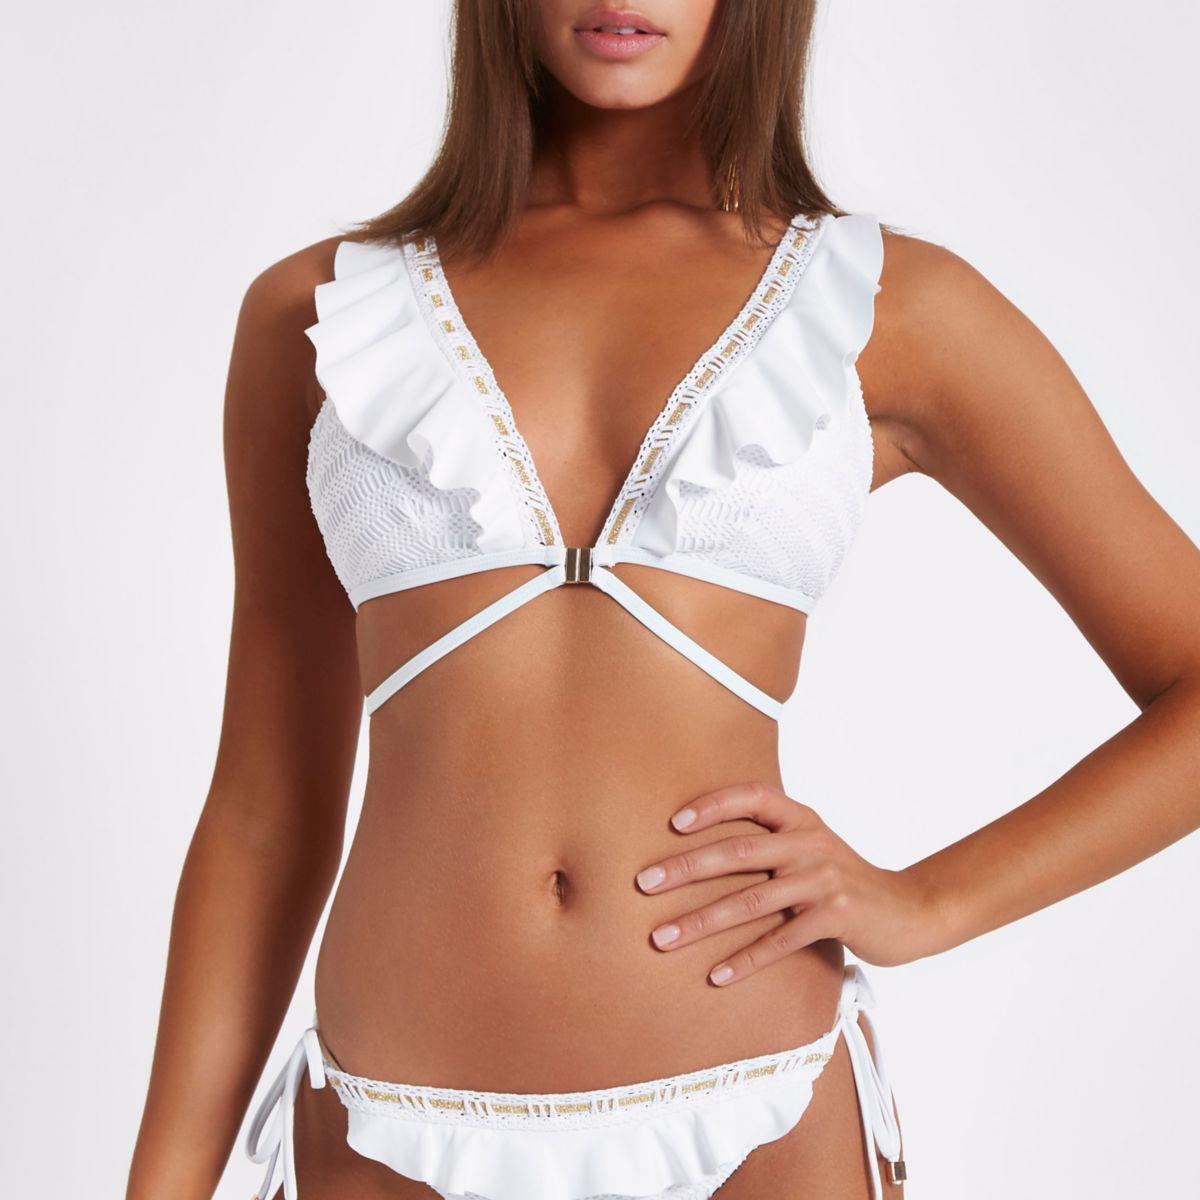 White high apex frill triangle bikini top